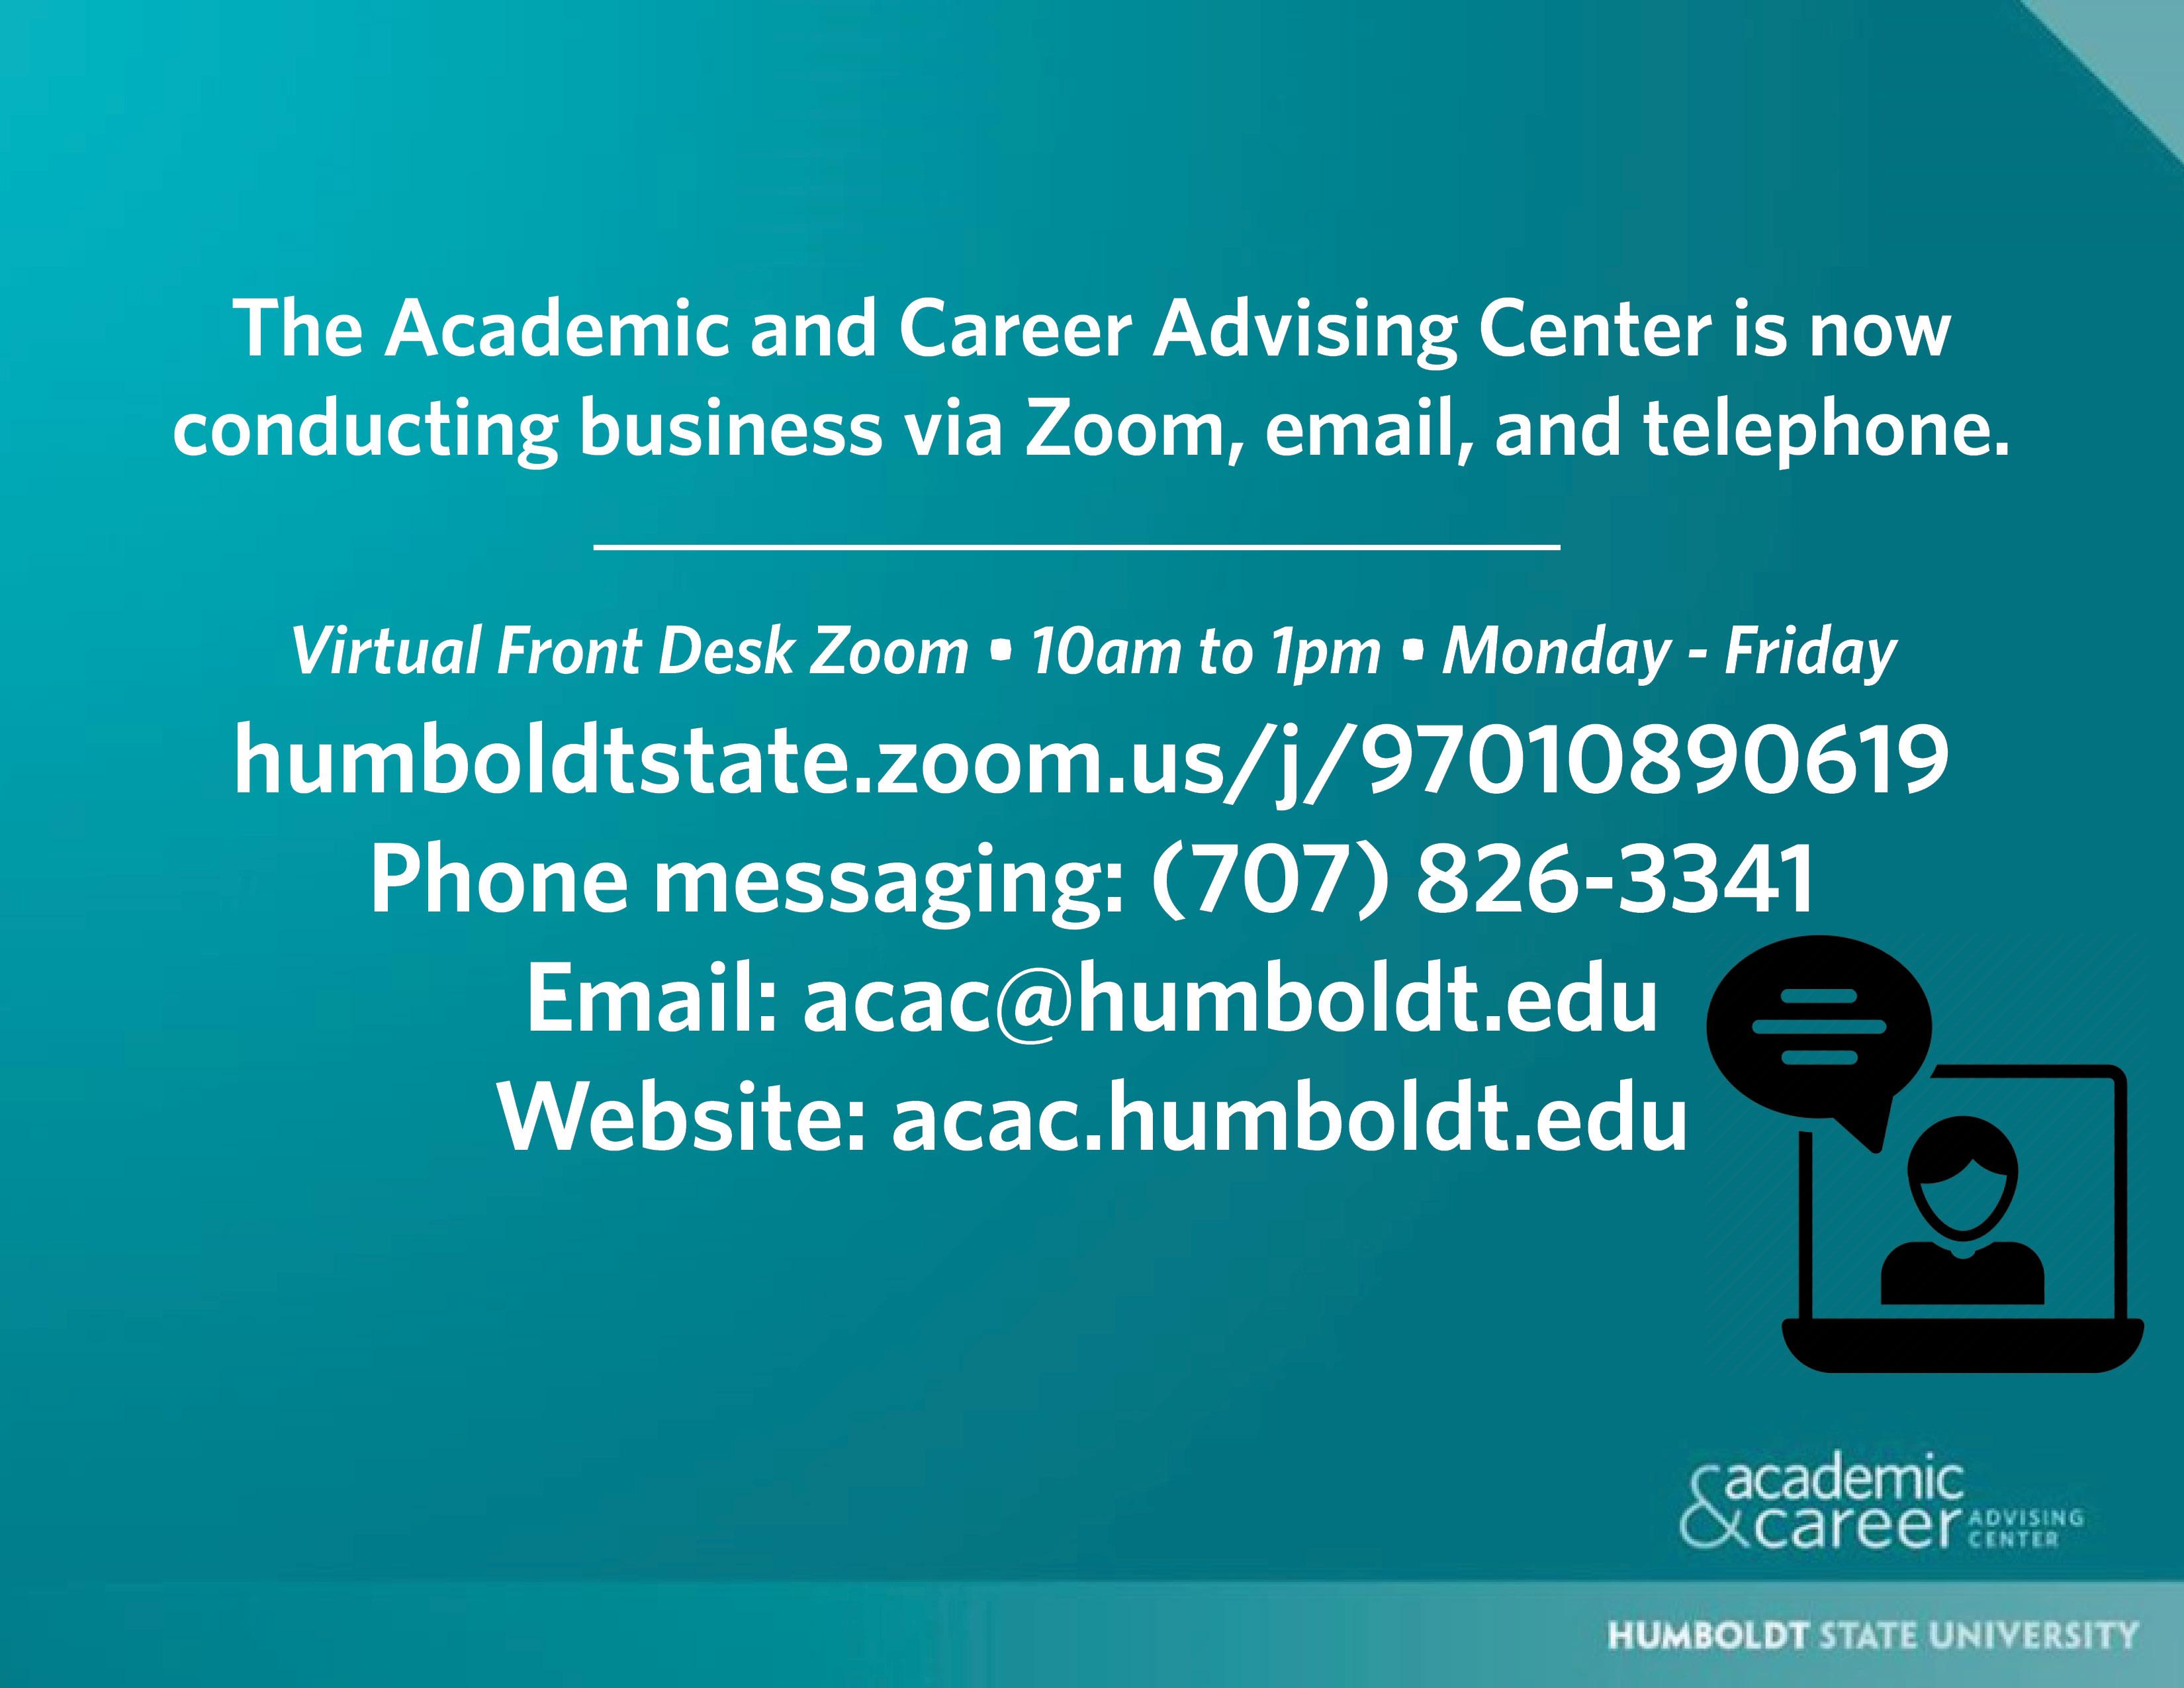 ACAC is virtual 7078263341 acac@humboldt.edu